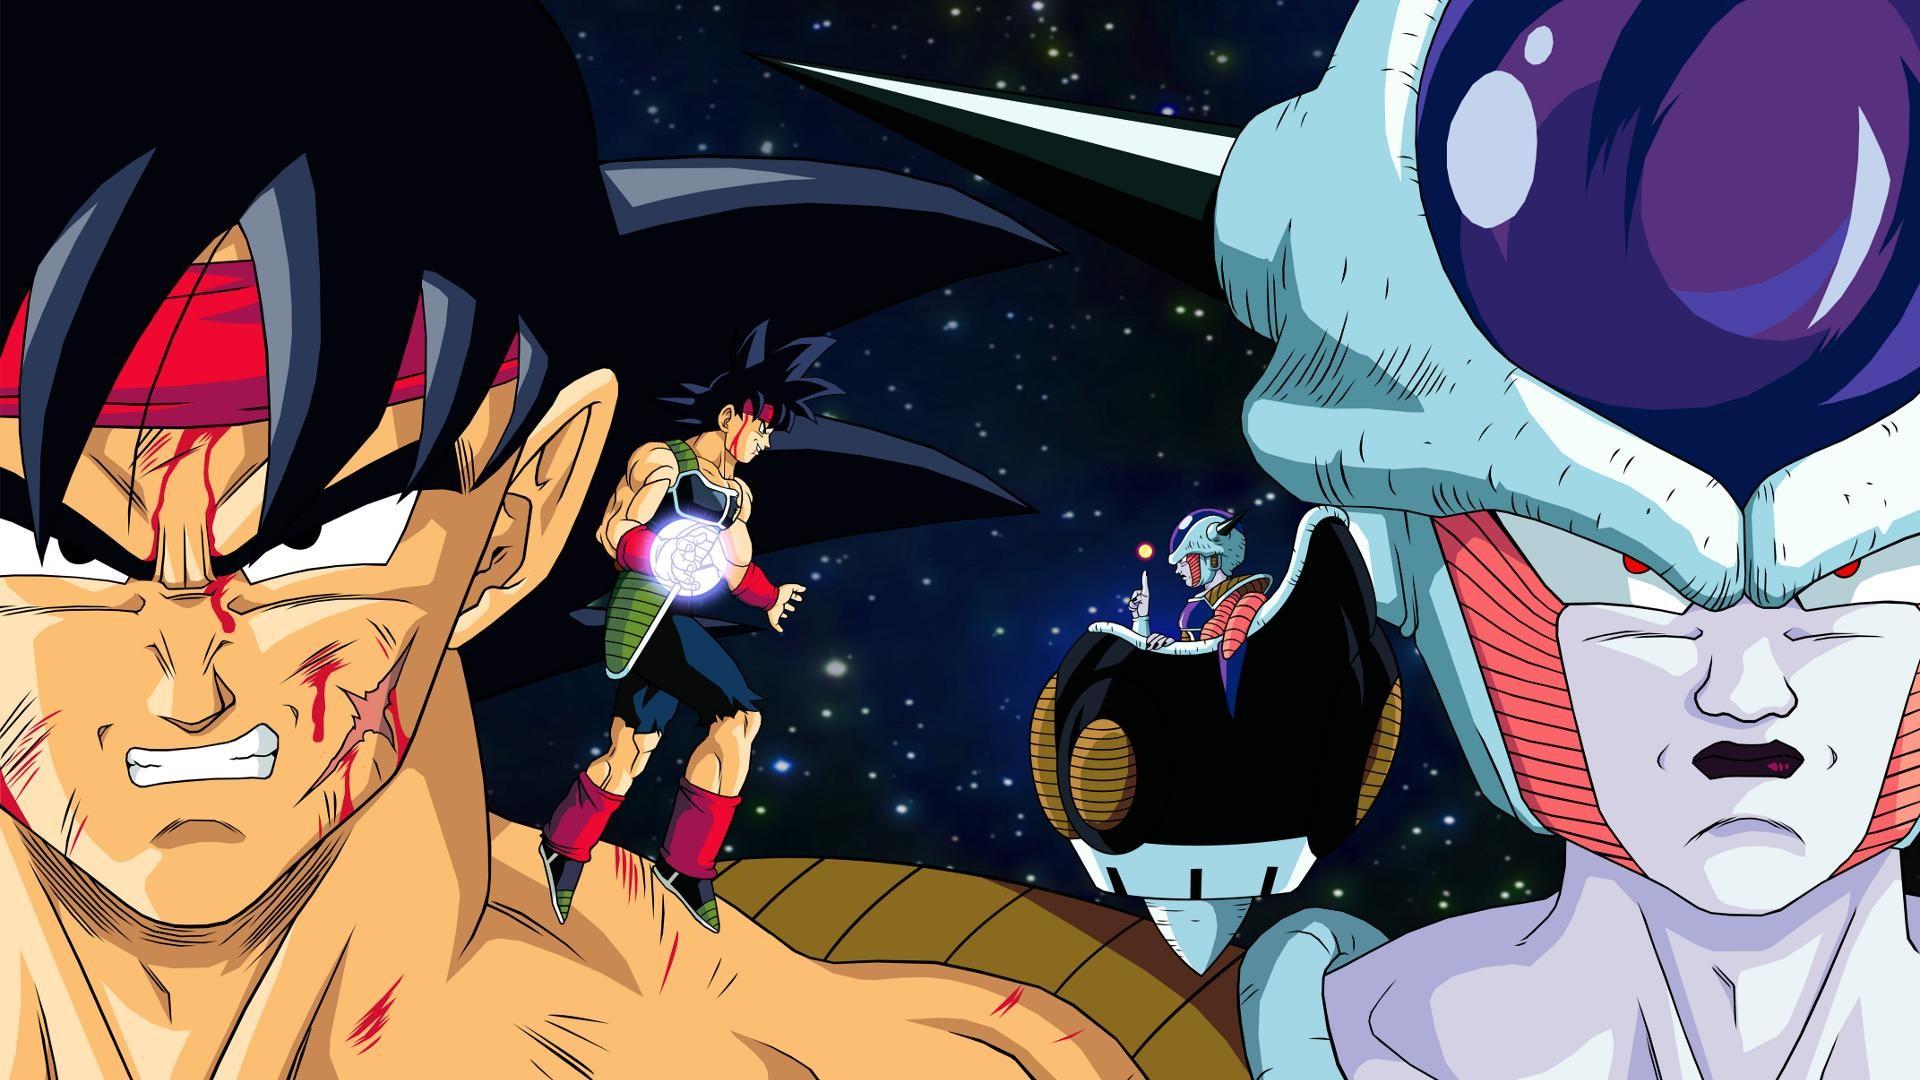 Wallpaper Illustration Anime Cartoon Dragon Ball Dragon Ball